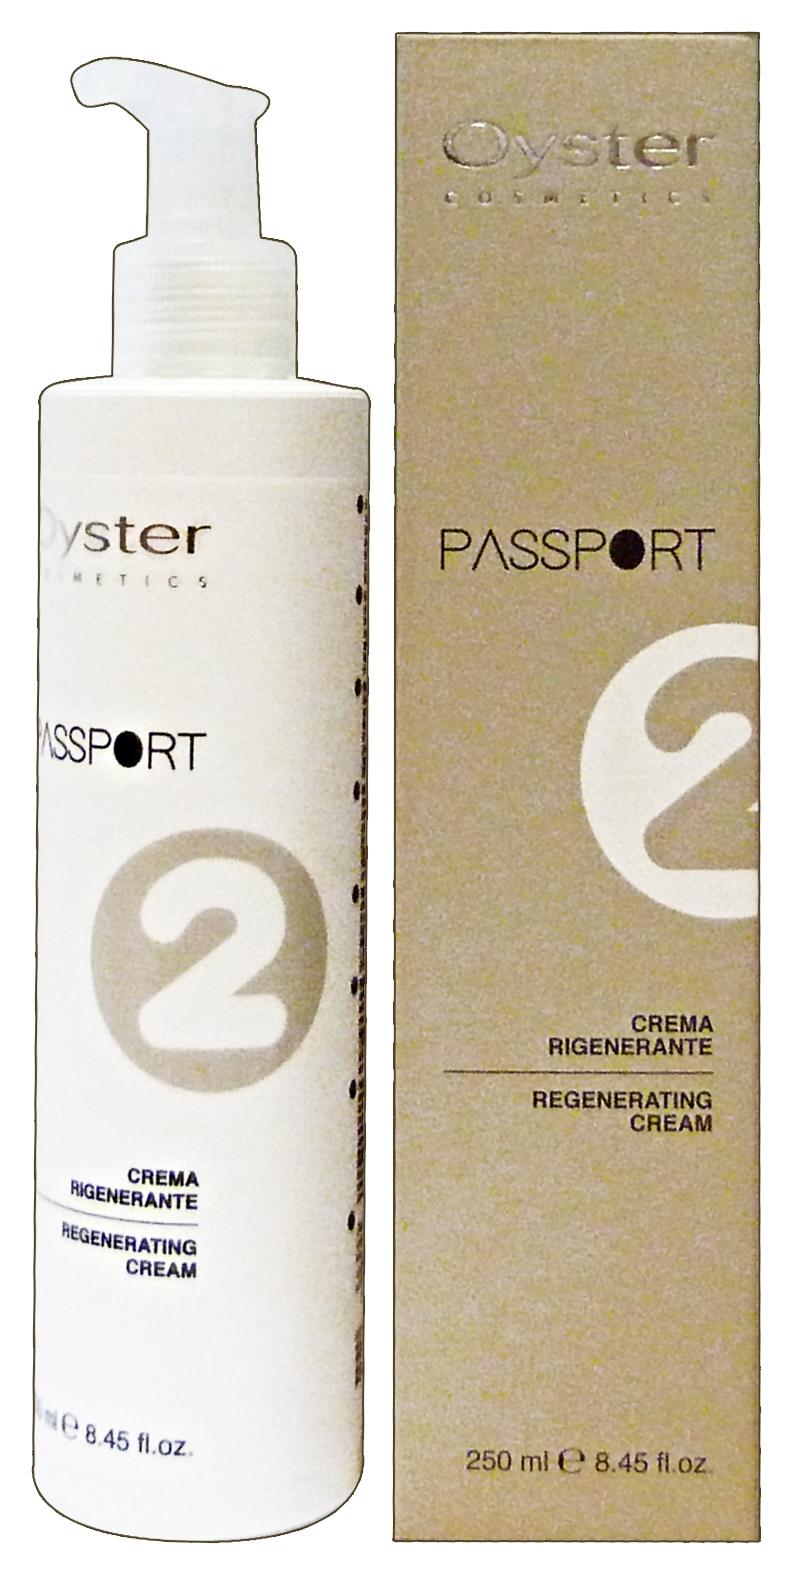 Buy Regenereting Fluid Passaport 2 Chemical 17457522 | Queency.co.uk